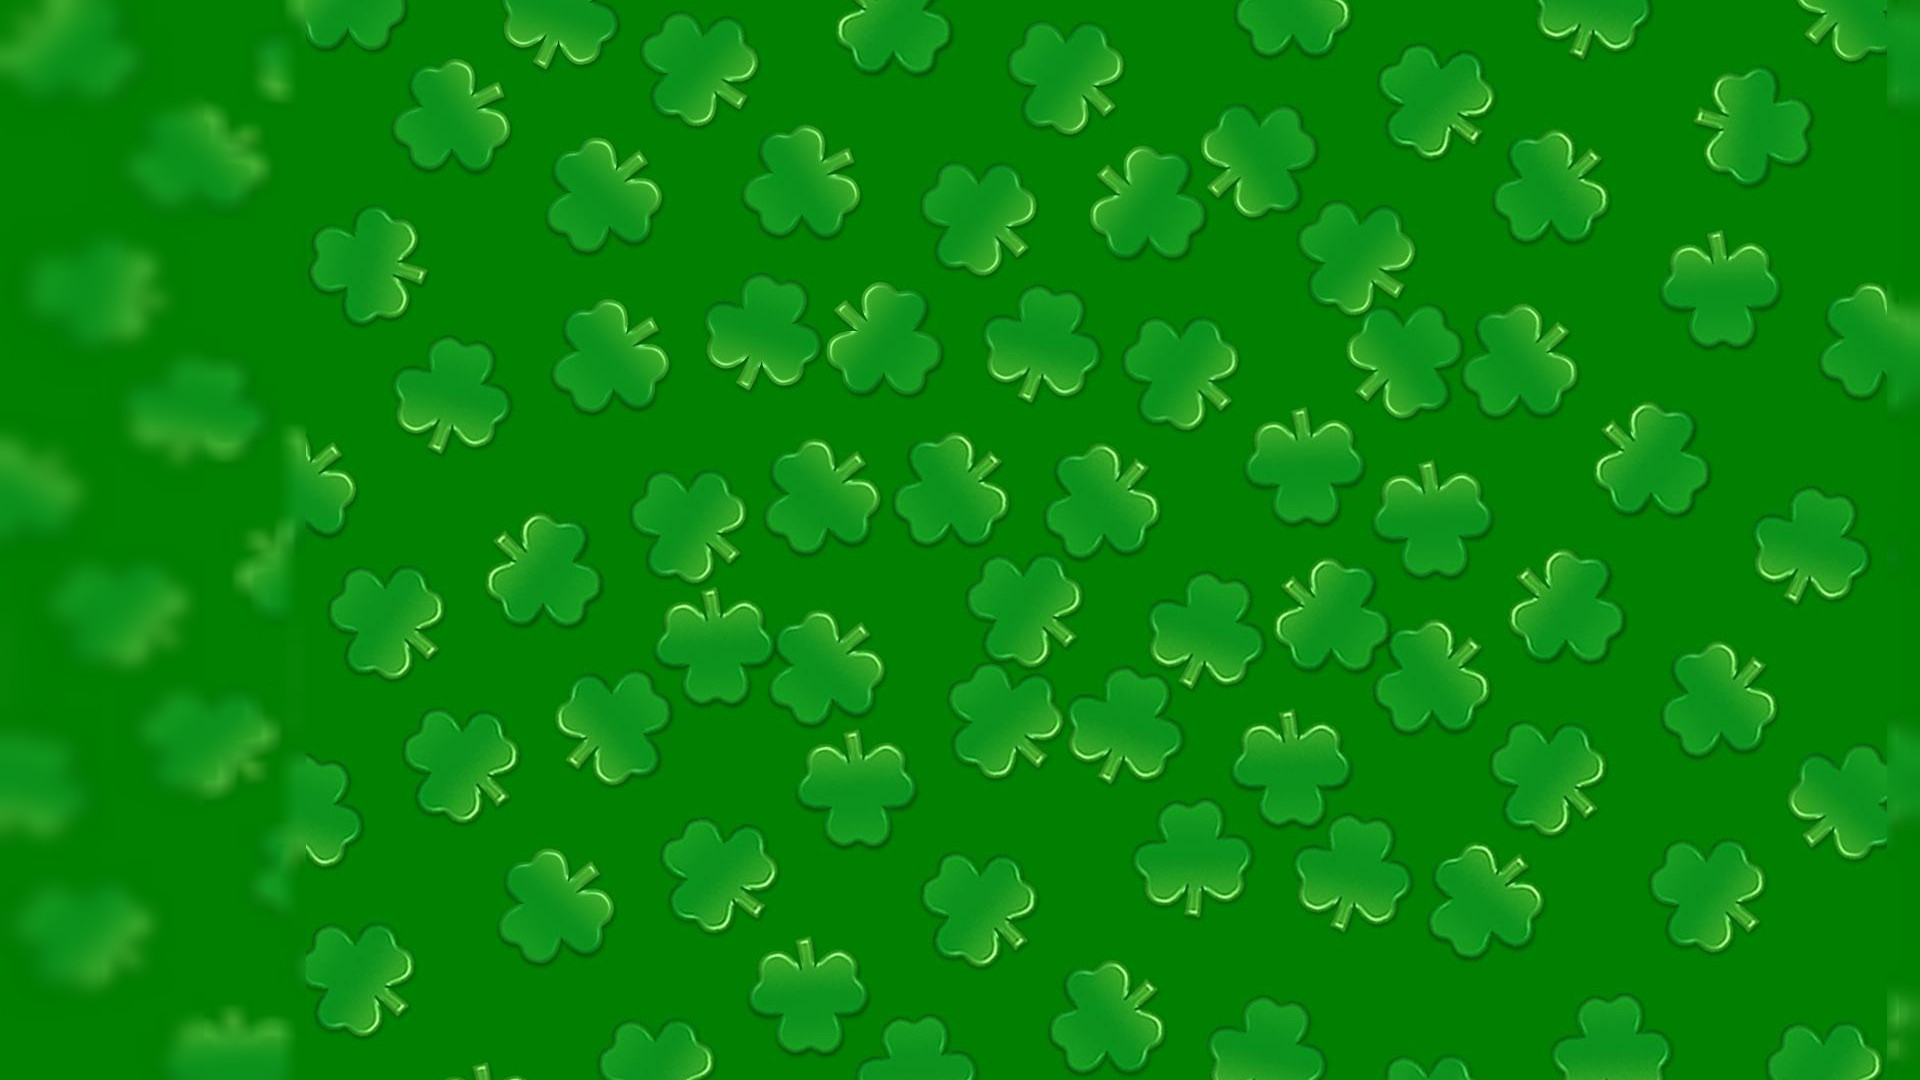 St Patricks Day Desktop Backgrounds - Wallpaper Cave